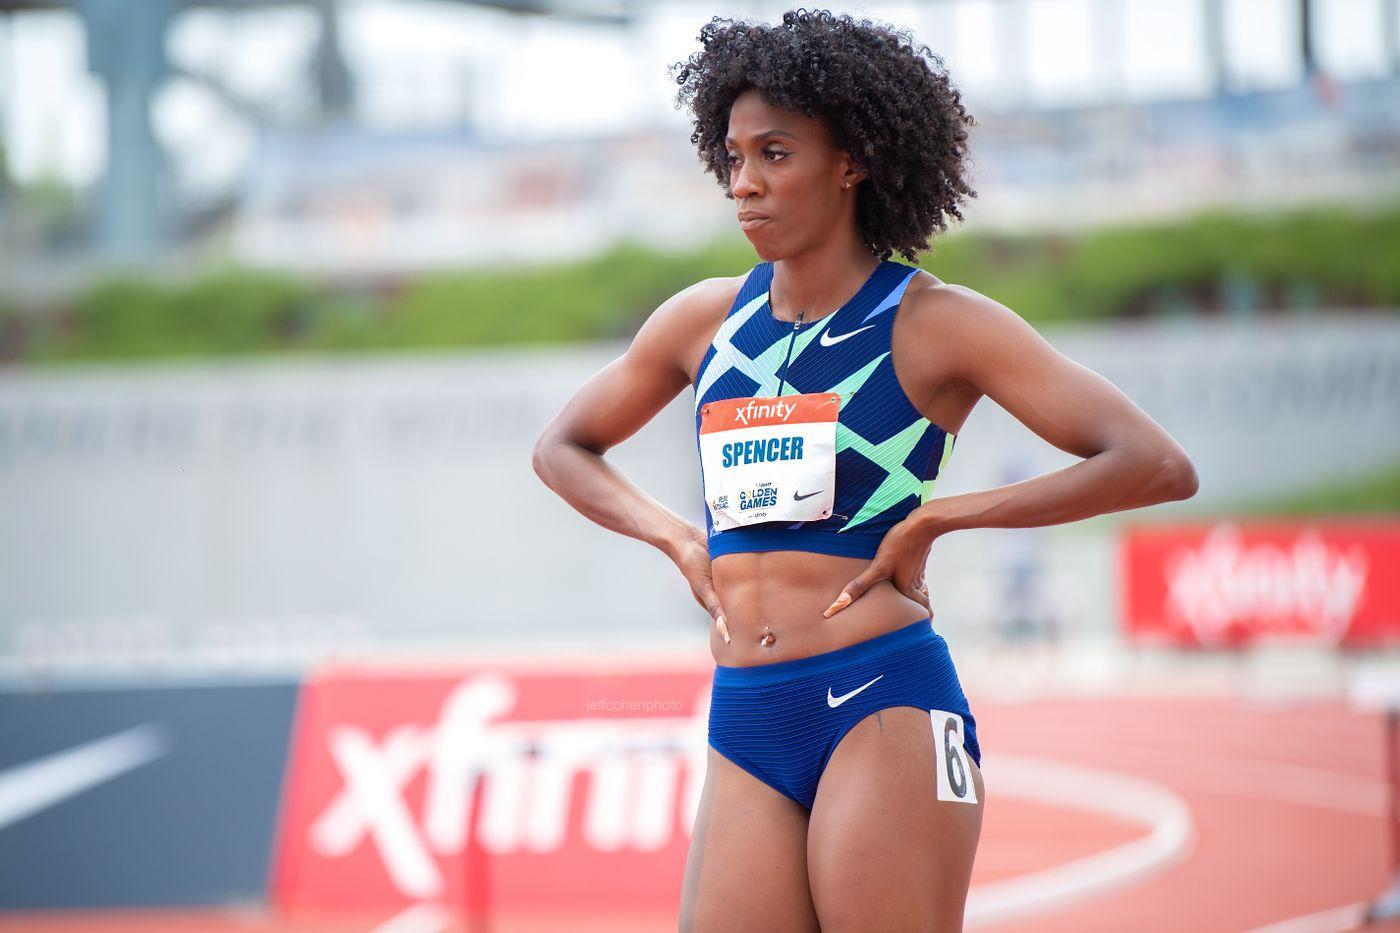 Ashley Spencer 400 meter hurdles